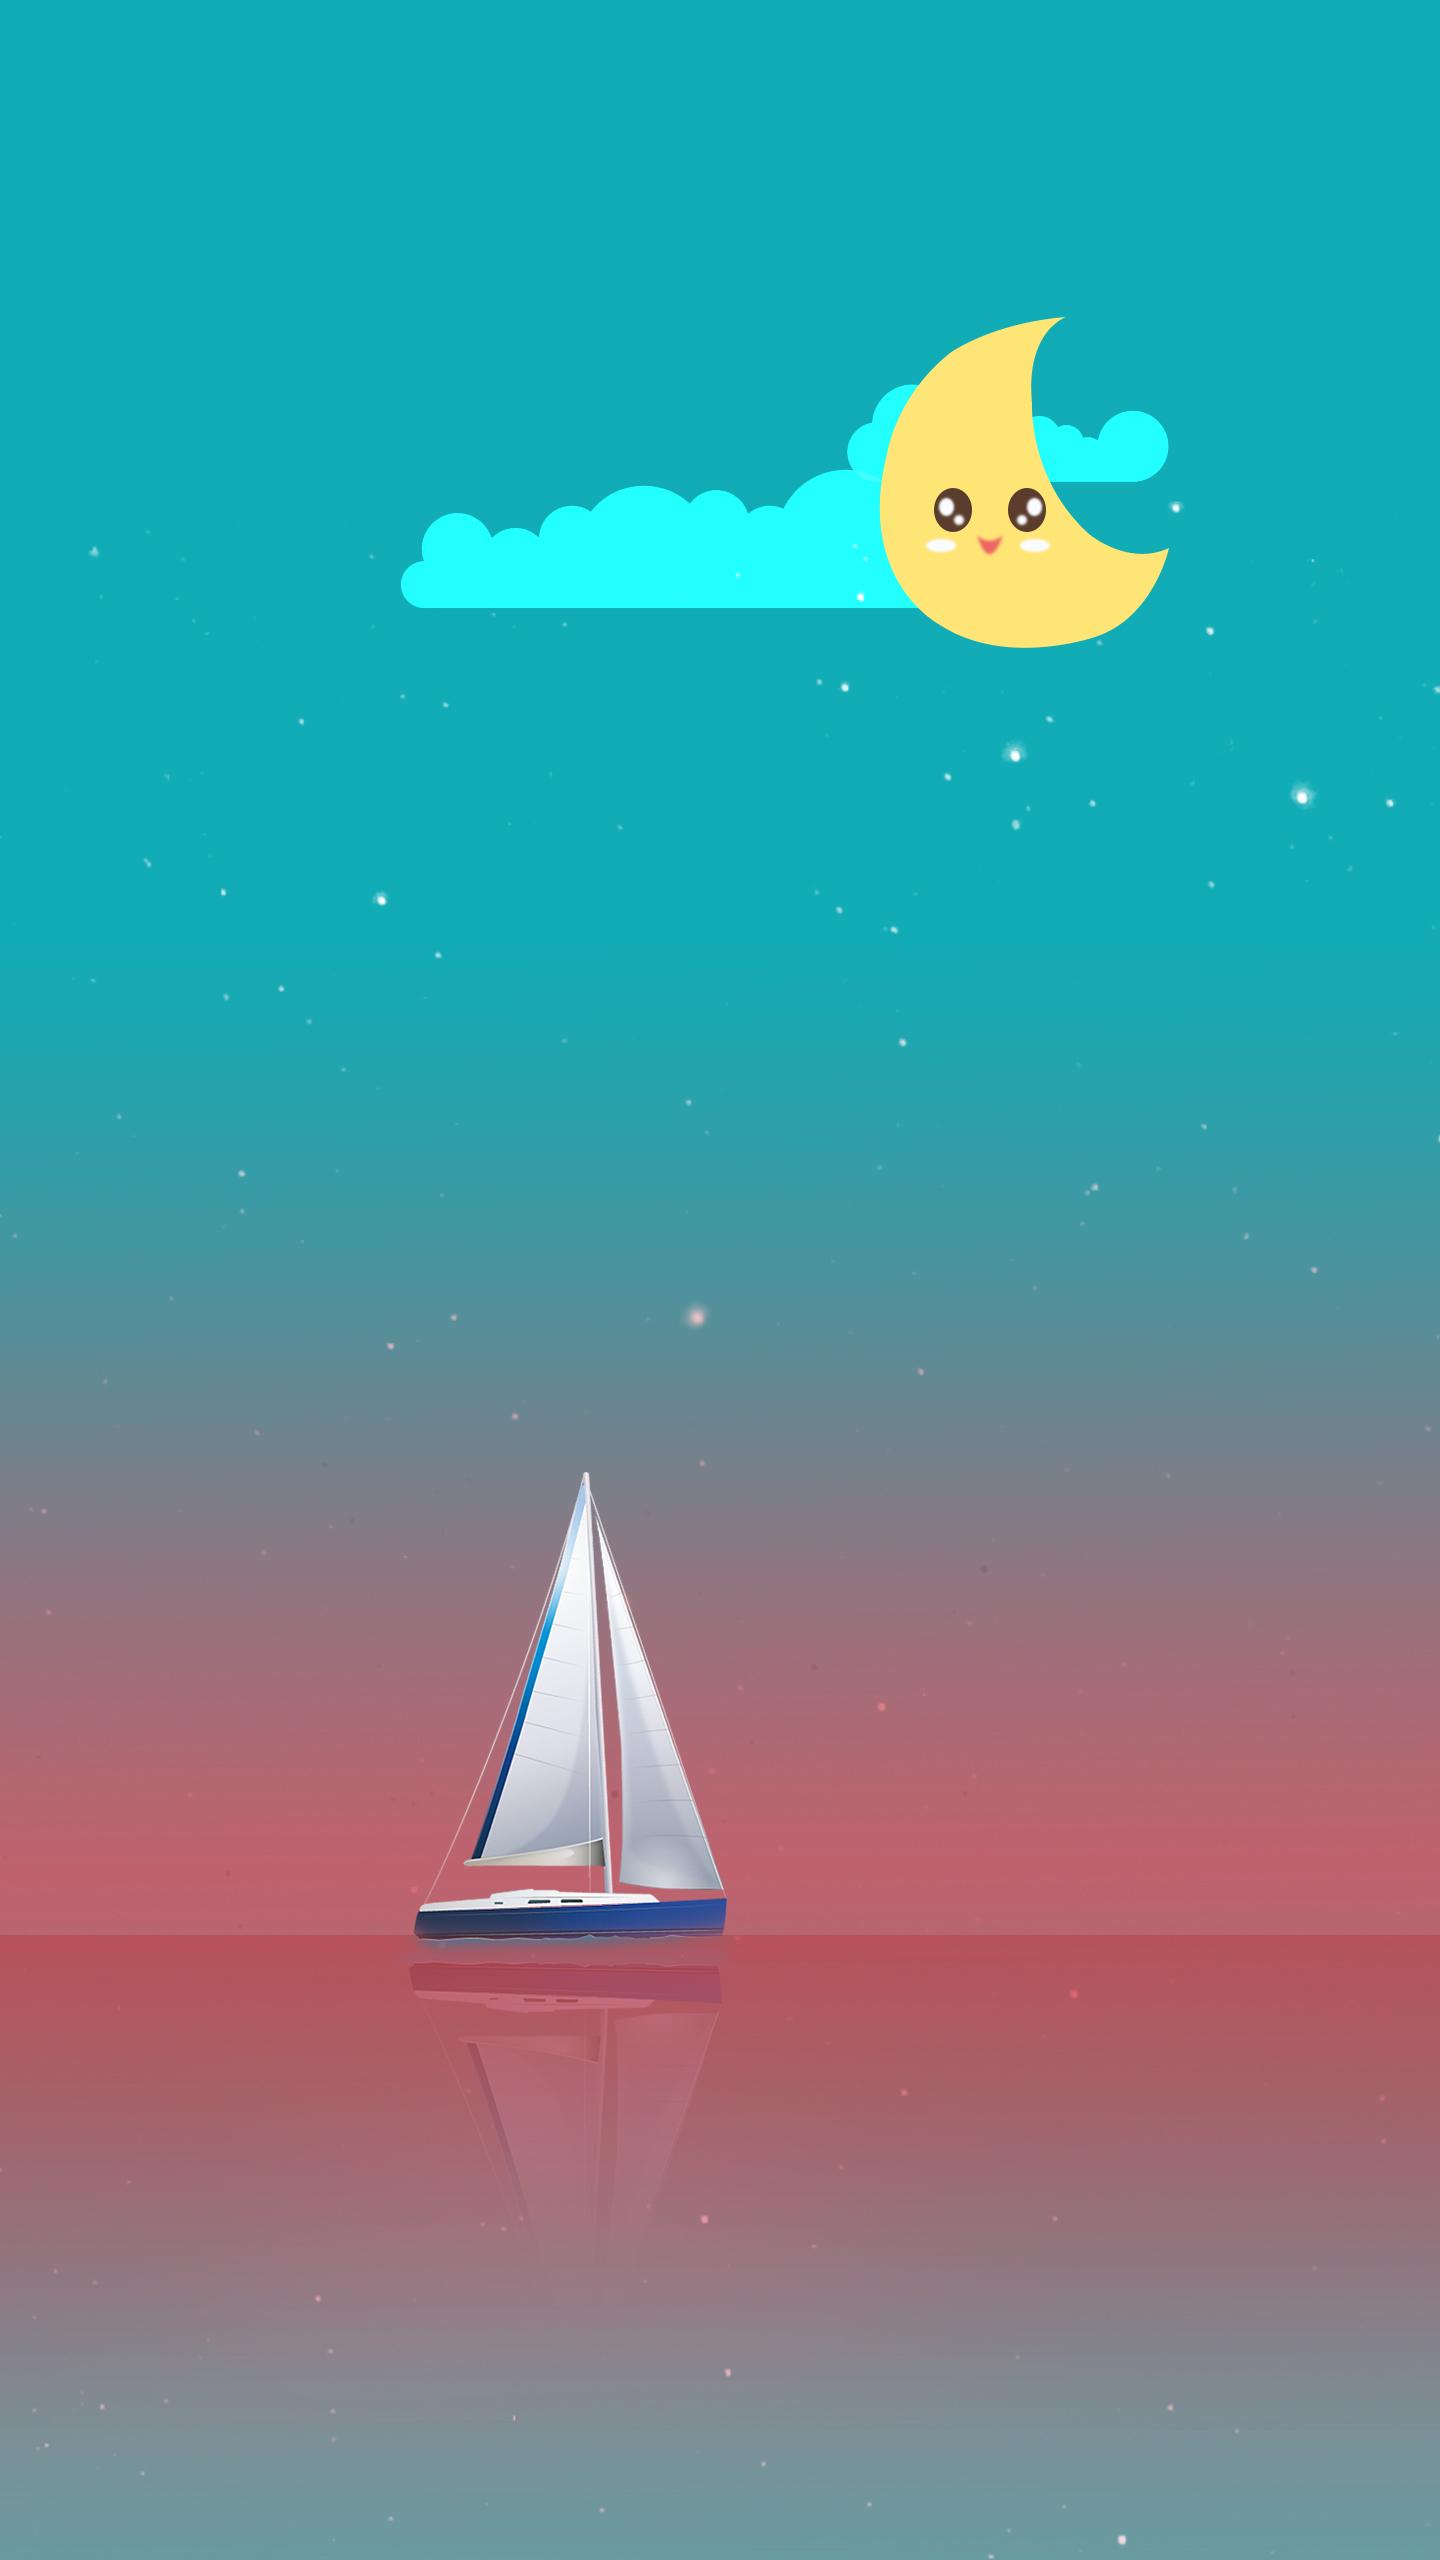 spesso Boat Wallpaper Galaxy S7 Edge by Mattiebonez on DeviantArt DM21